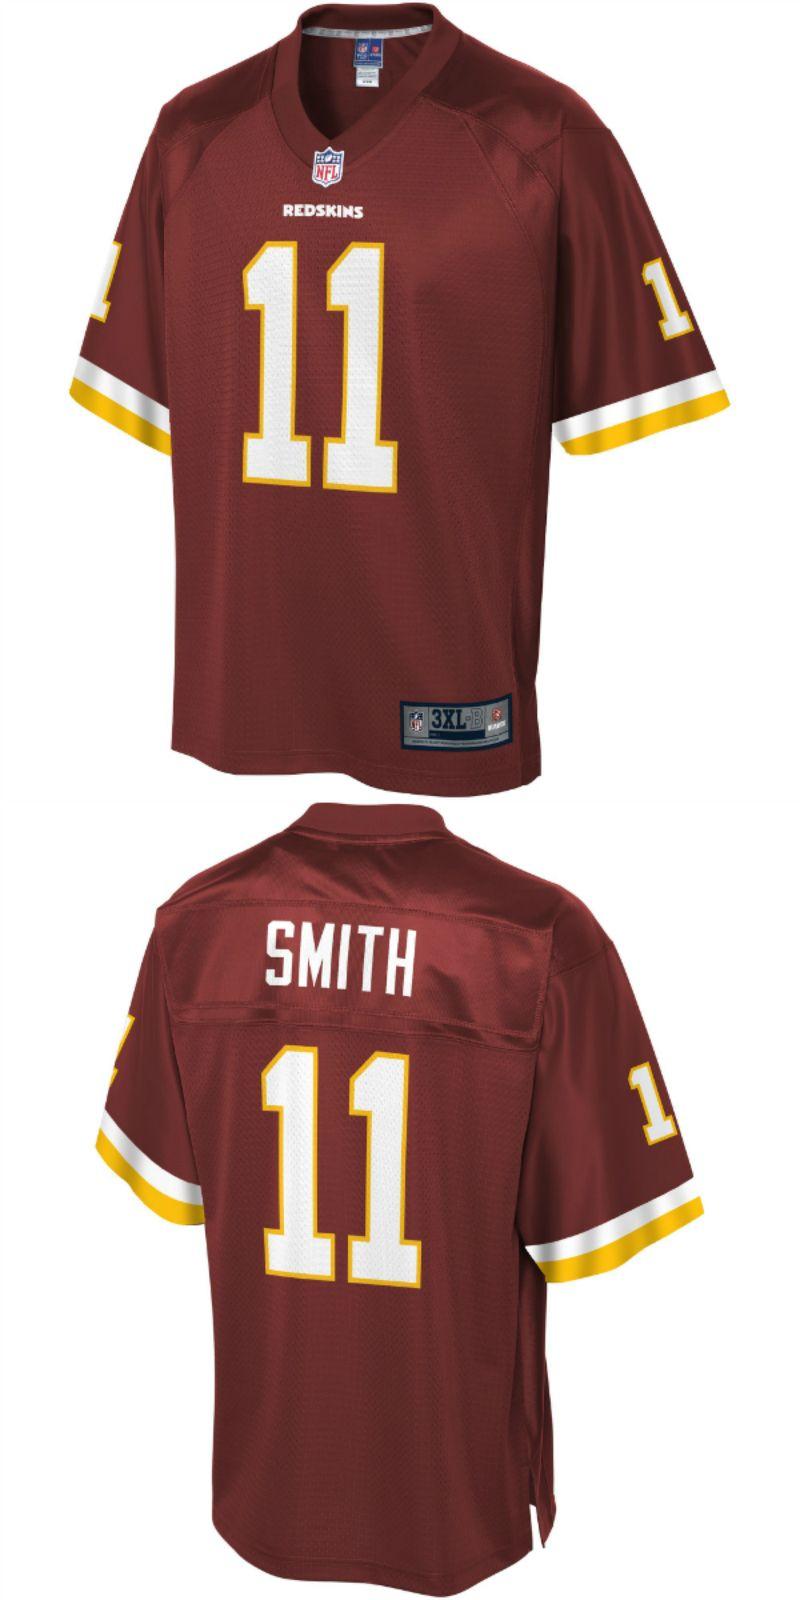 sale retailer 0b8e0 b9998 UP TO 70% OFF. Alex Smith Washington Redskins NFL Pro Line ...